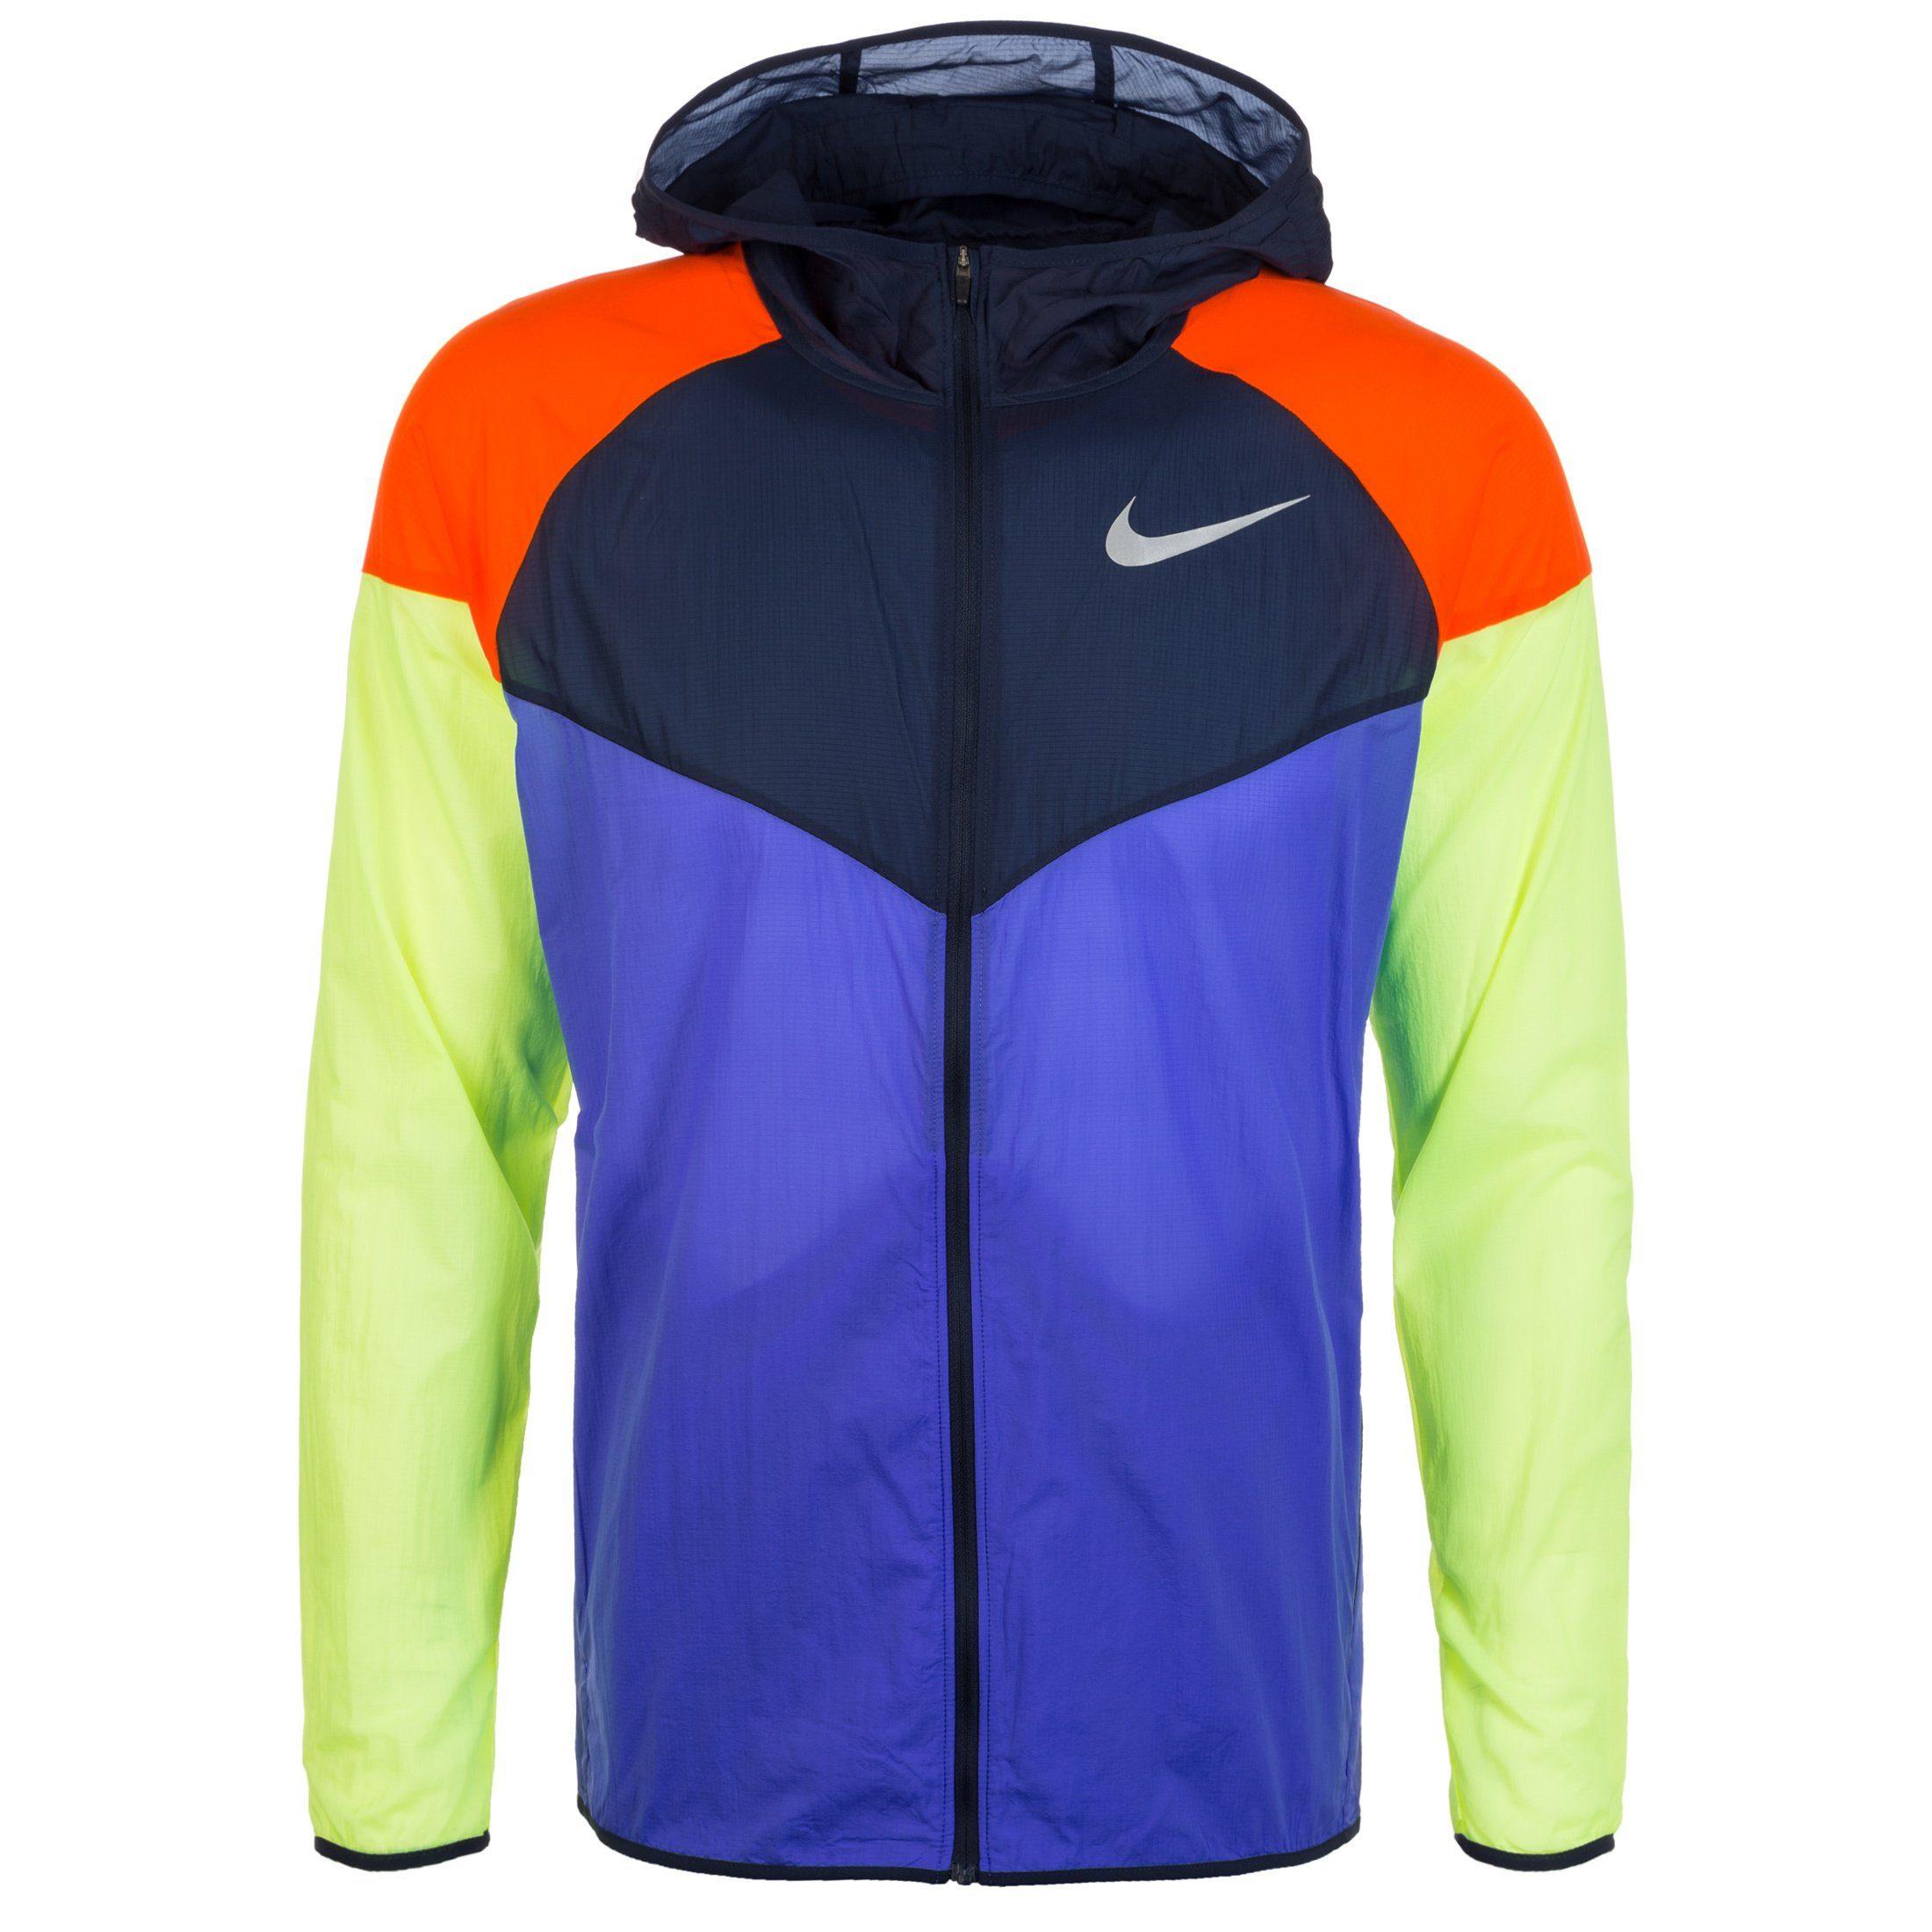 Nike Laufjacke Windrunner | Sportbekleidung > Sportjacken > Laufjacken | Nike